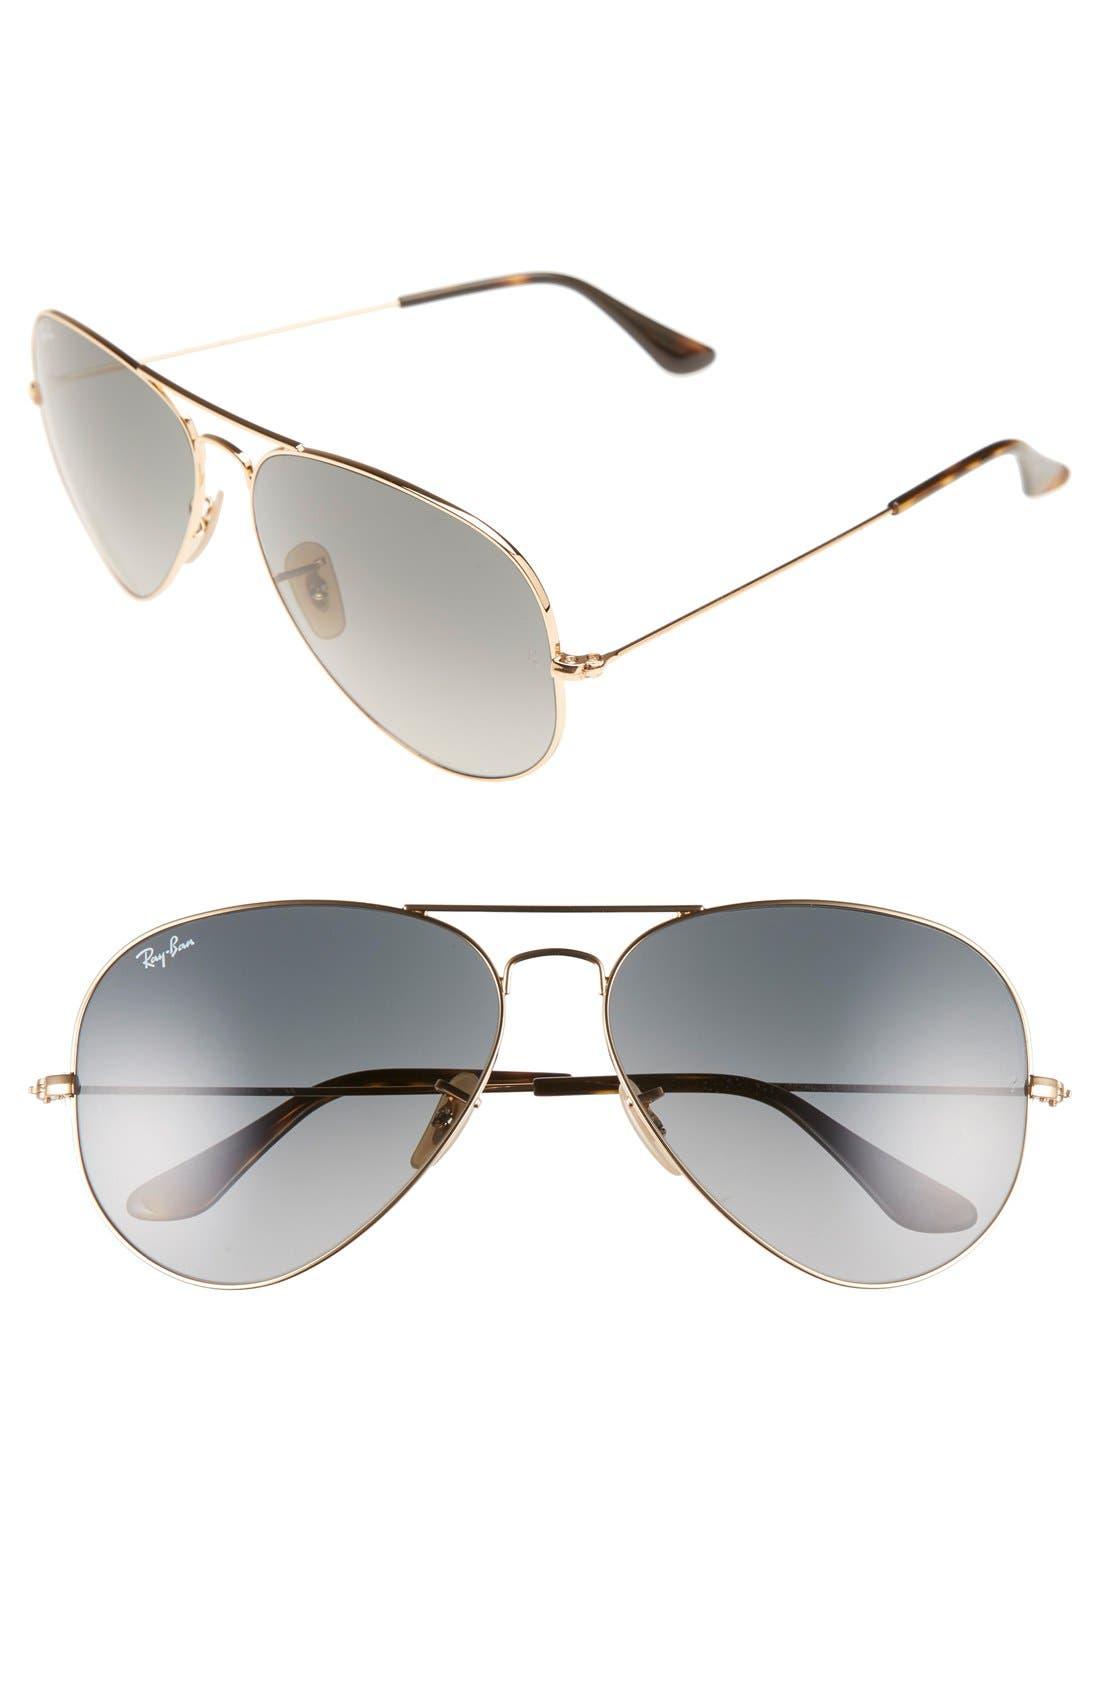 RAY-BAN, 'Org Aviator' 62mm Sunglasses, Main thumbnail 1, color, GOLD/ GREY GRADIENT